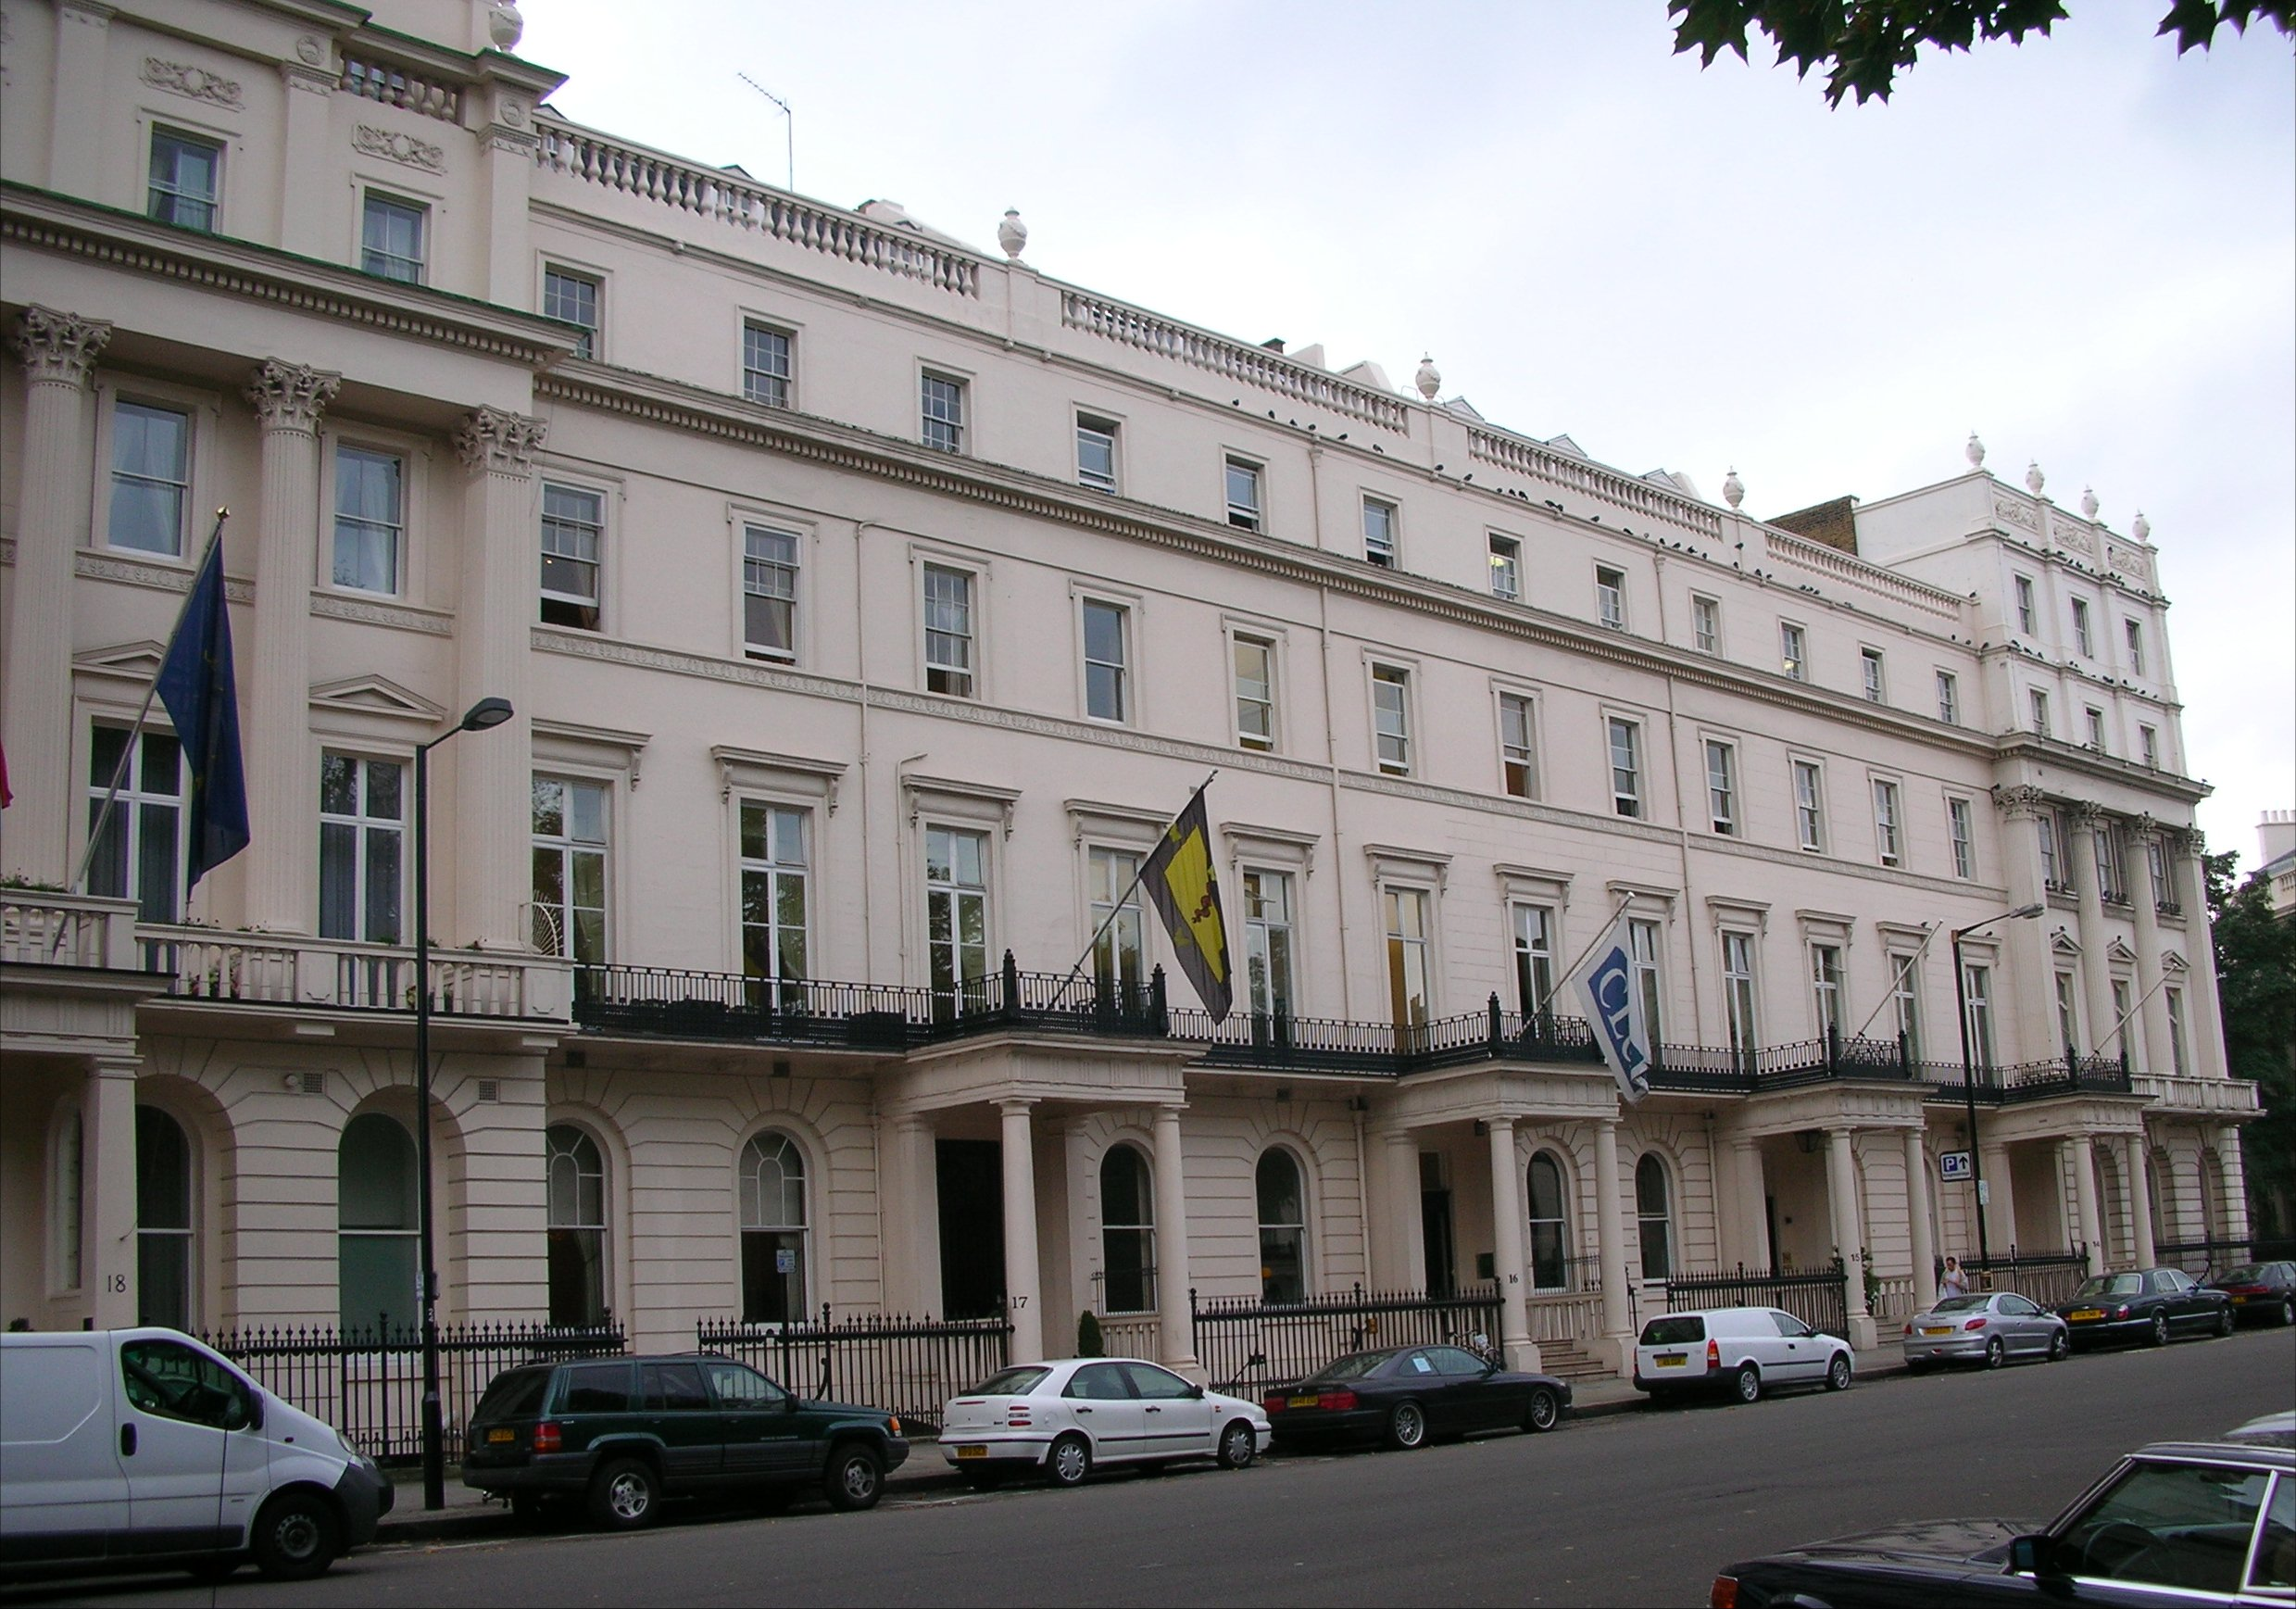 Hotel Beaumont Londres